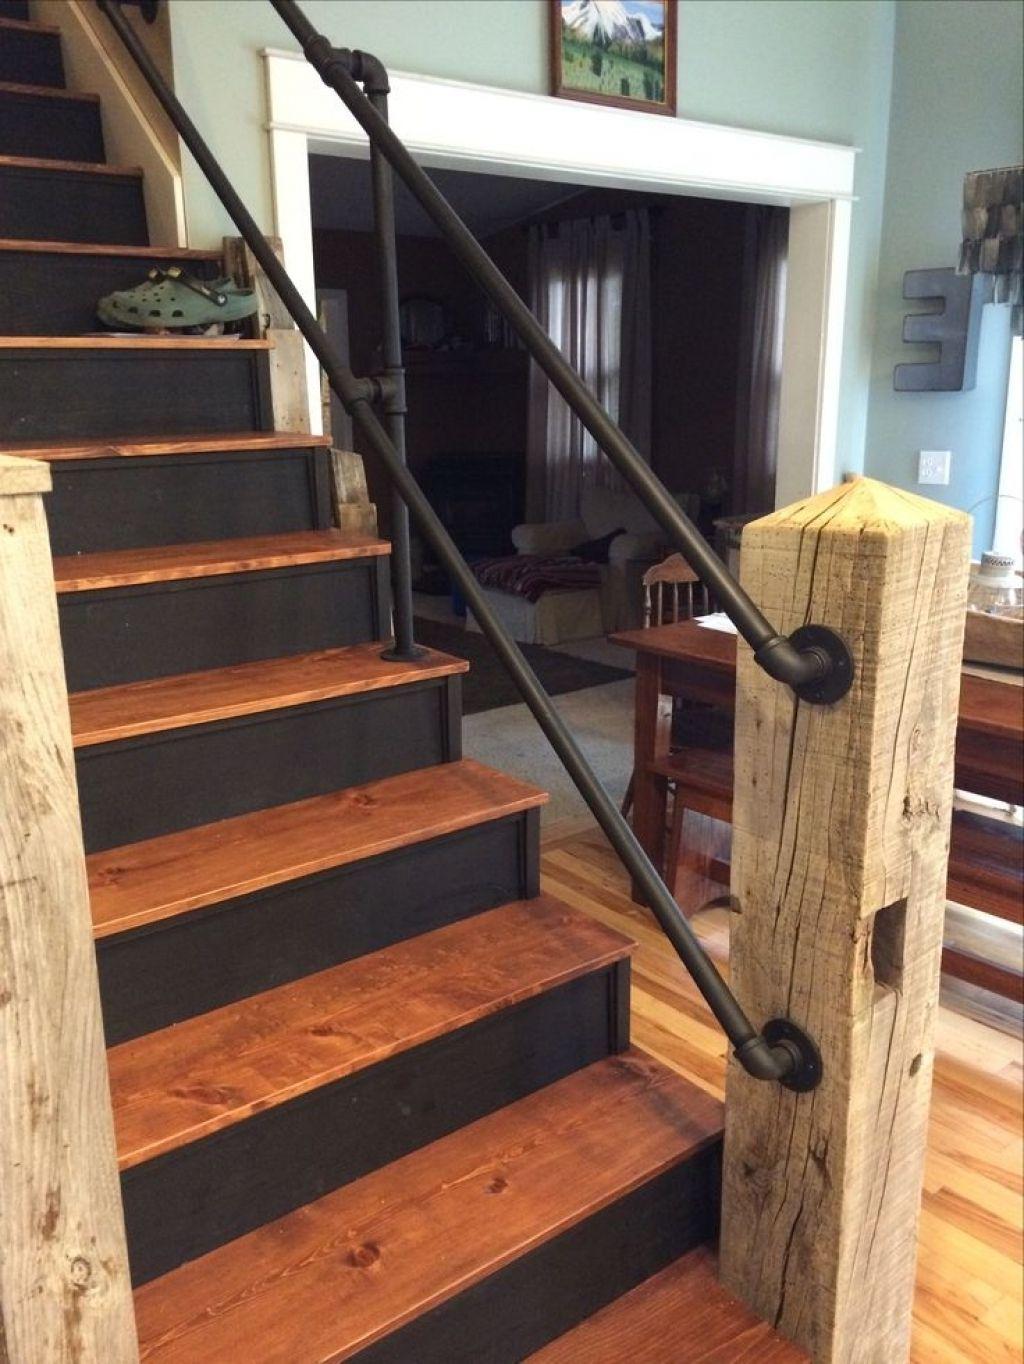 Diy Stair Railing Kits Biocert Stair Railing Makeover Diy   Stair Banisters And Railings   Residential   Guardrail   Indoor   Baluster   Metal